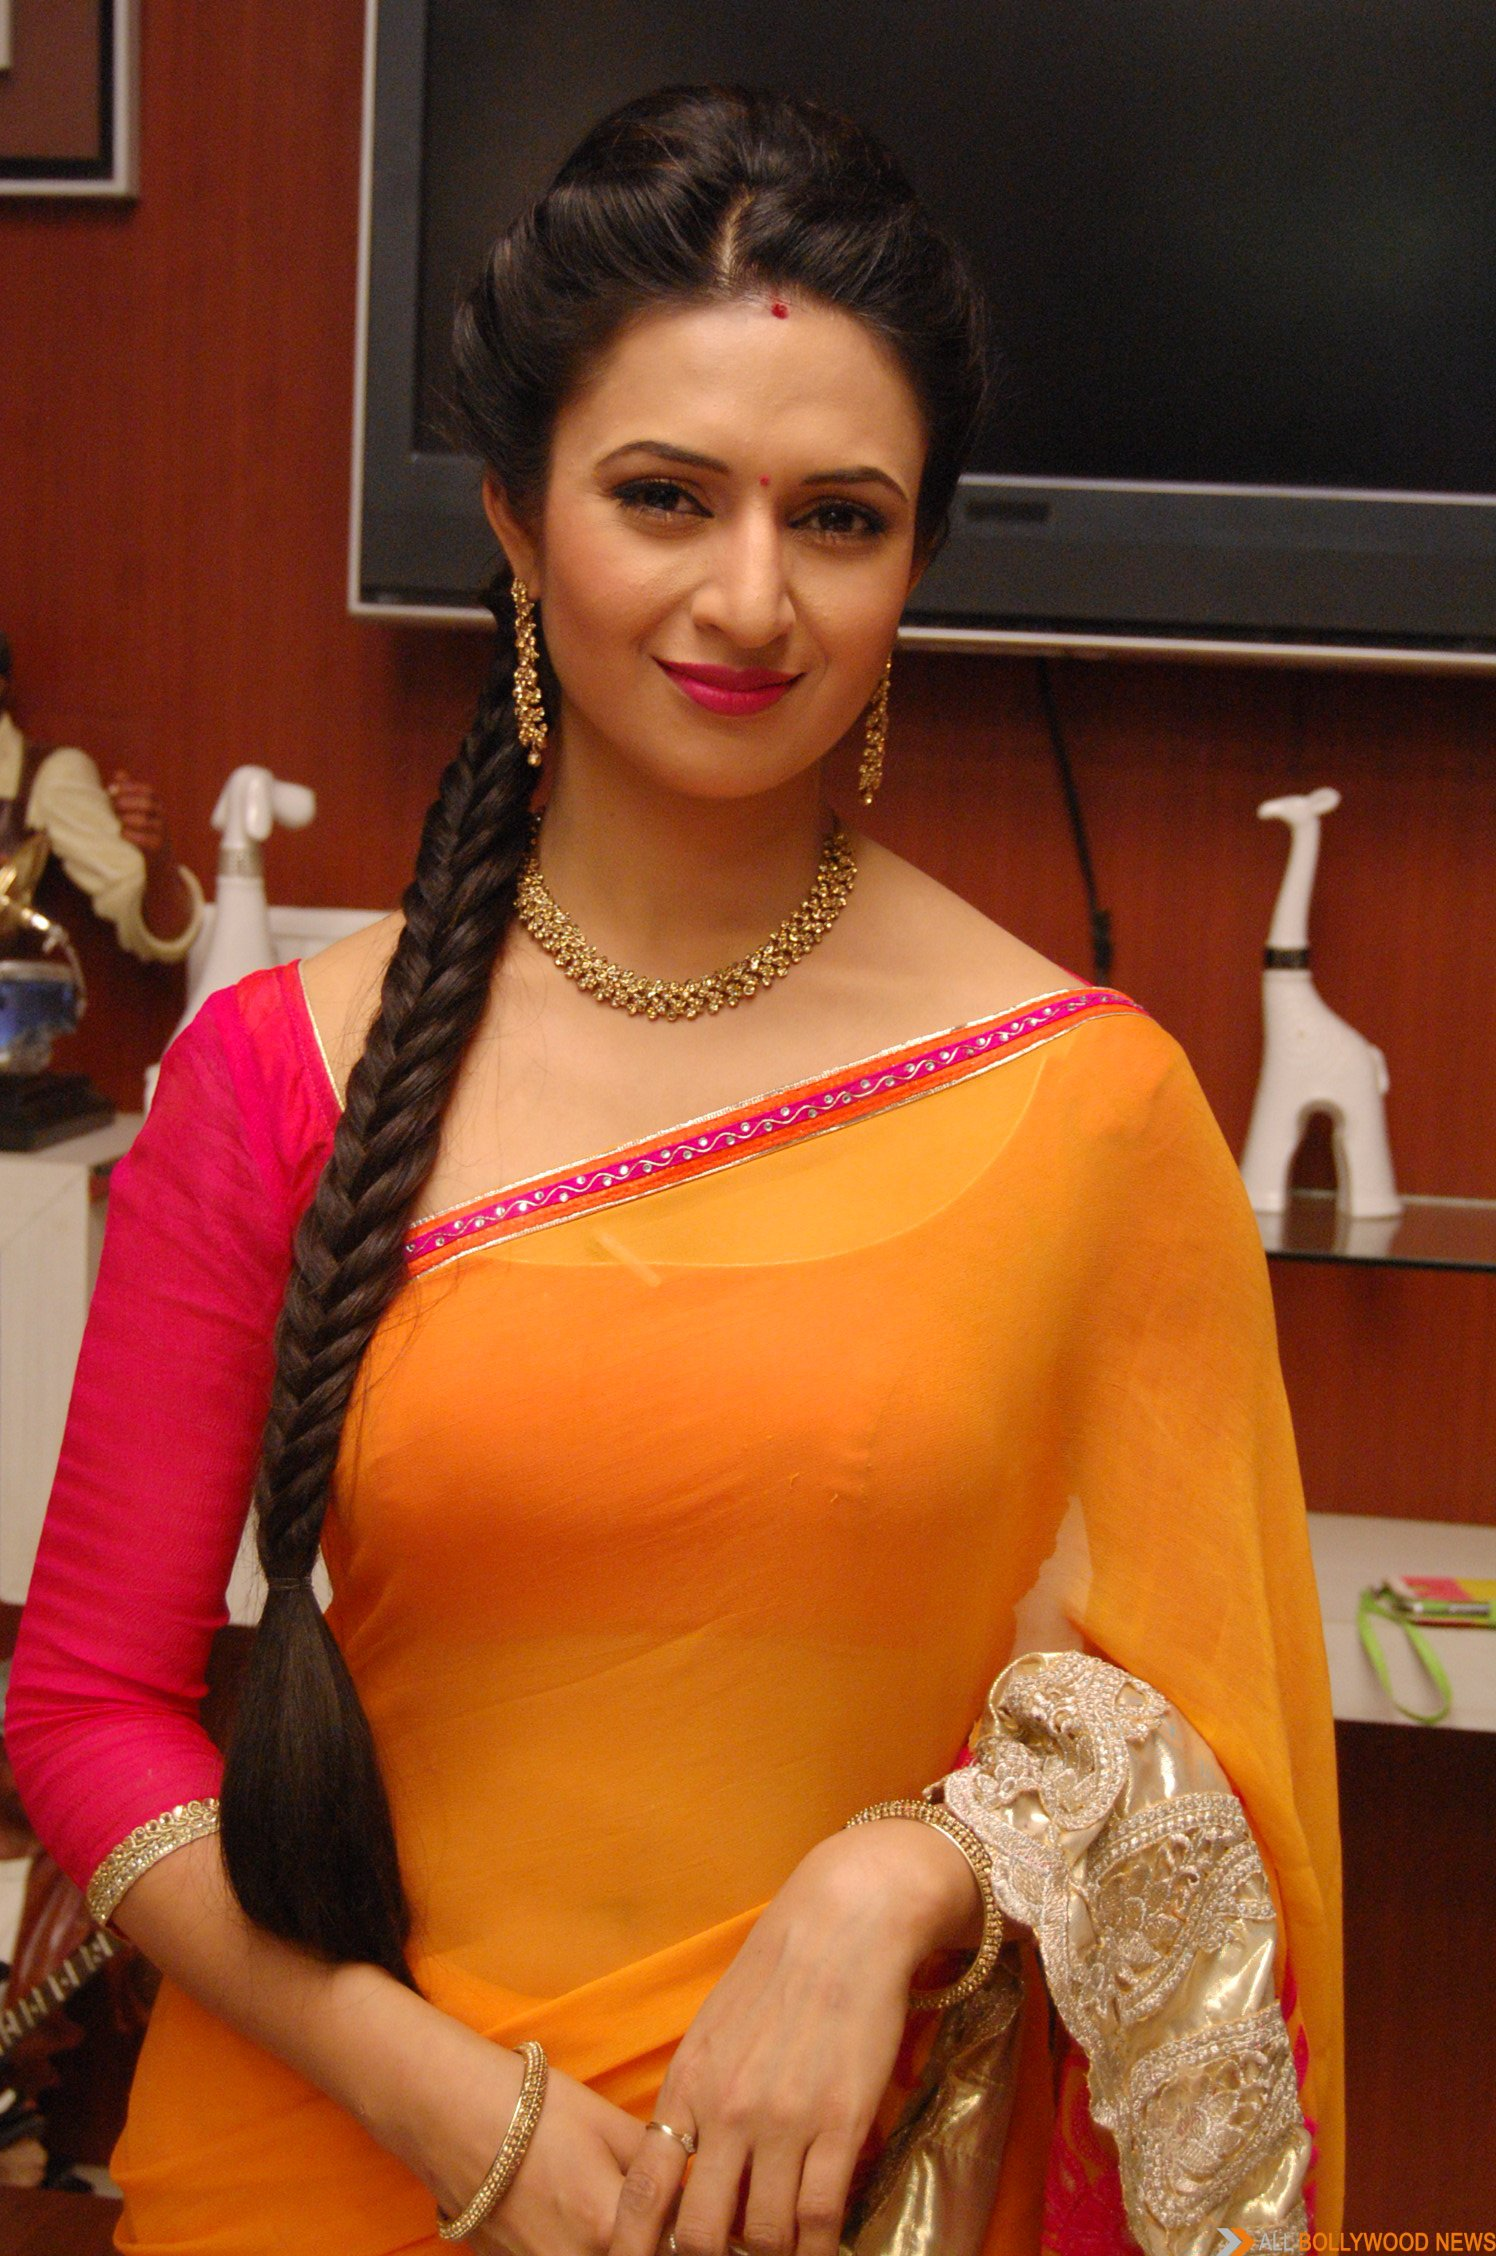 Divyanka faints on the sets of Ye Hai Mohabbatein - All Bollywood News